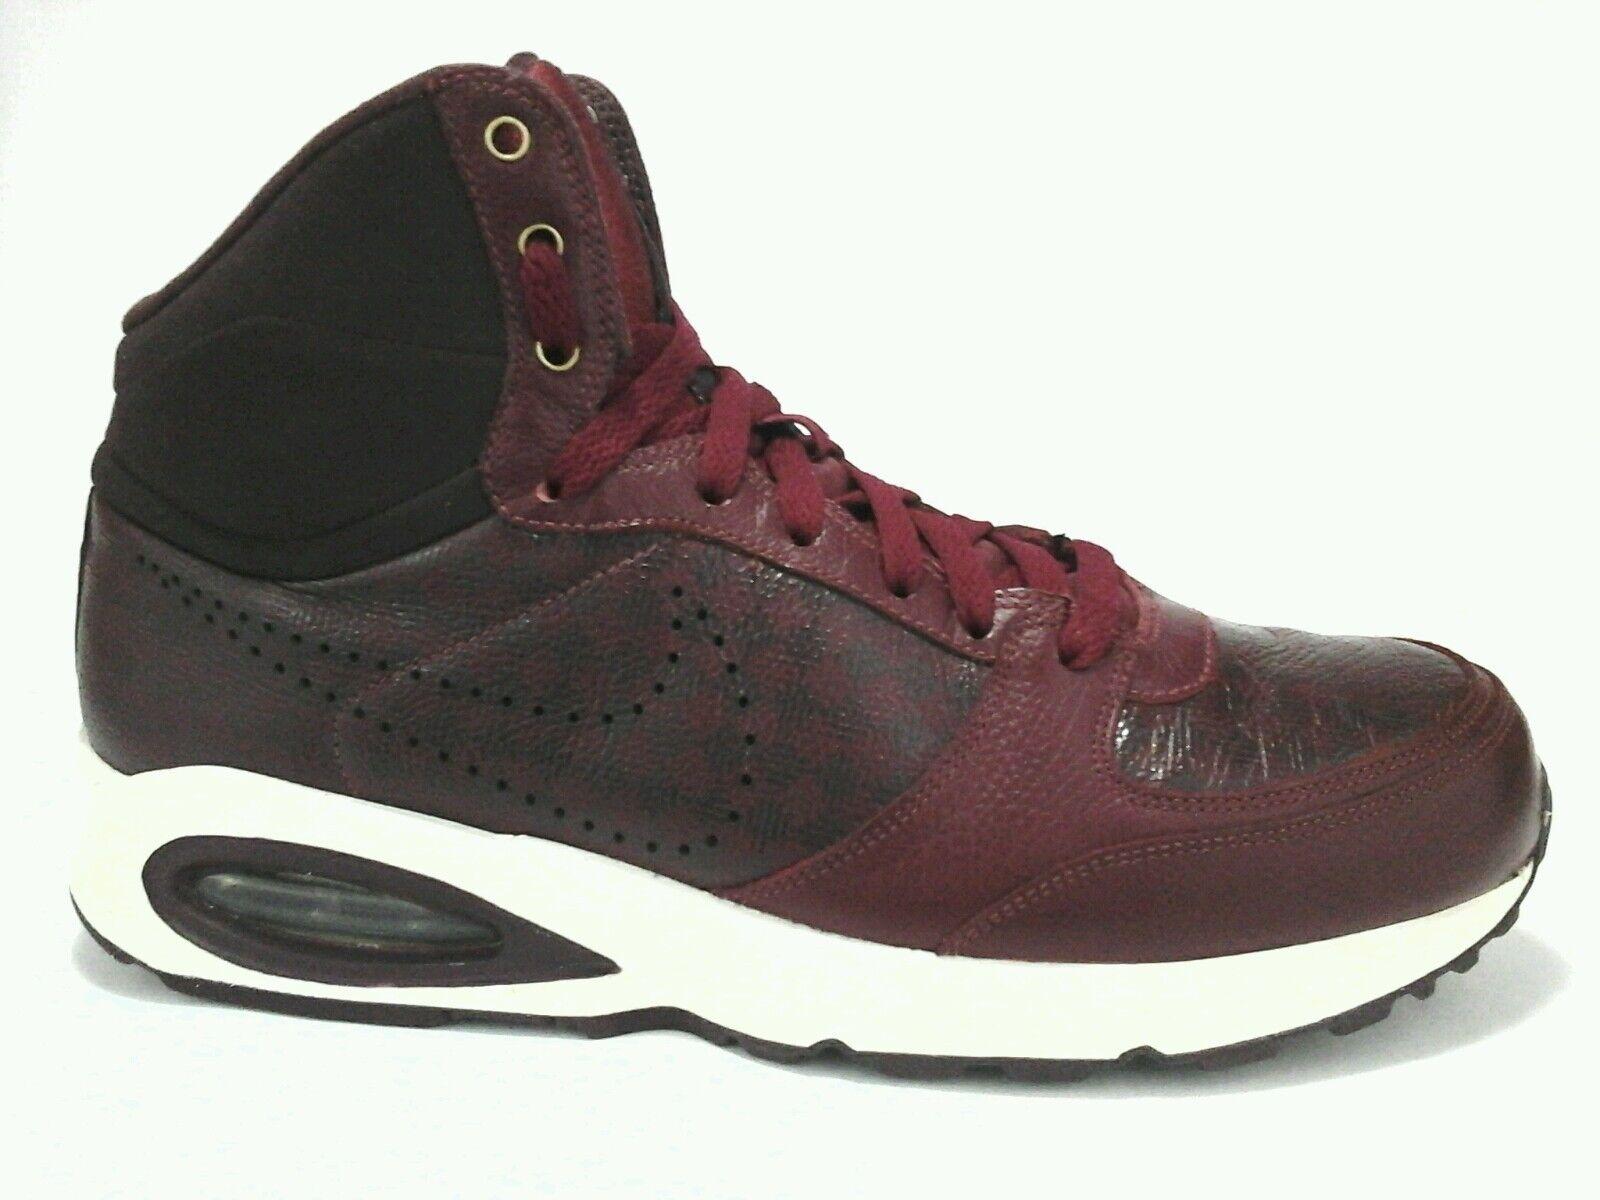 Nike AIR MAX INTERNATIONAL Burgundy Red Shoes Men s US 9 UK 8 EUR 42.5 RARE ec08f3faafc